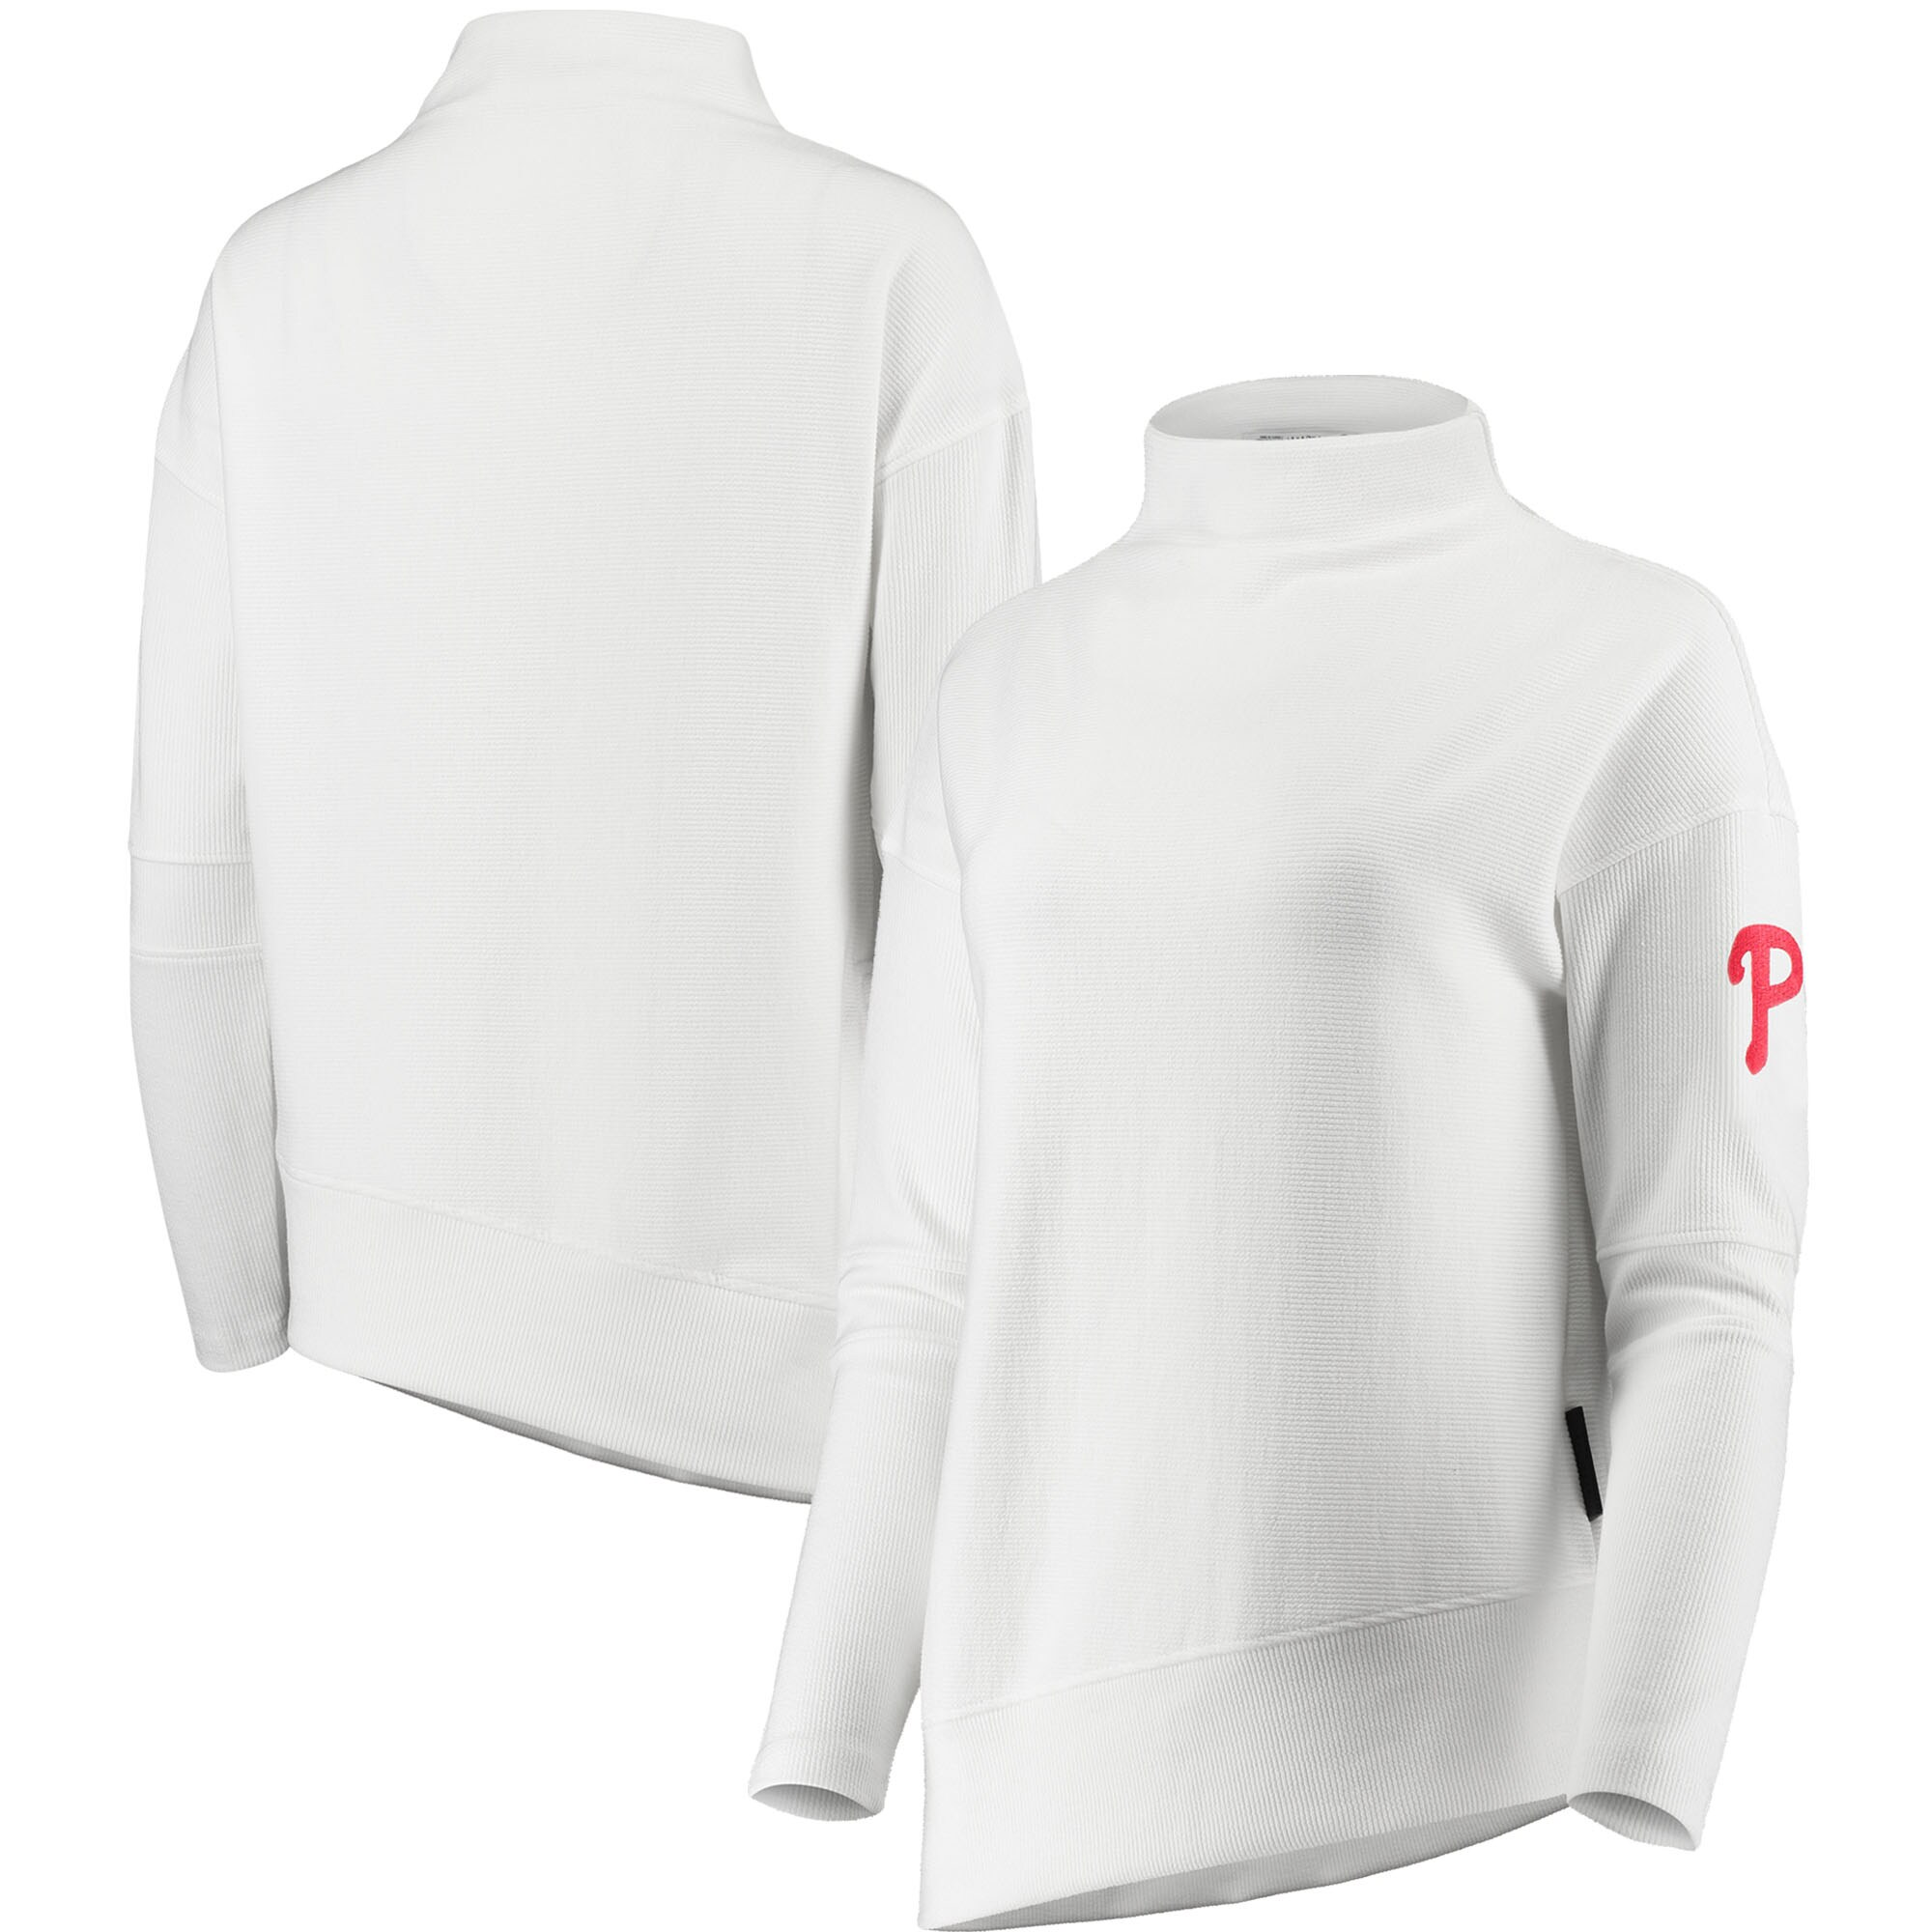 Philadelphia Phillies Levelwear Women's Lana Mock Neck Pullover Sweatshirt - White